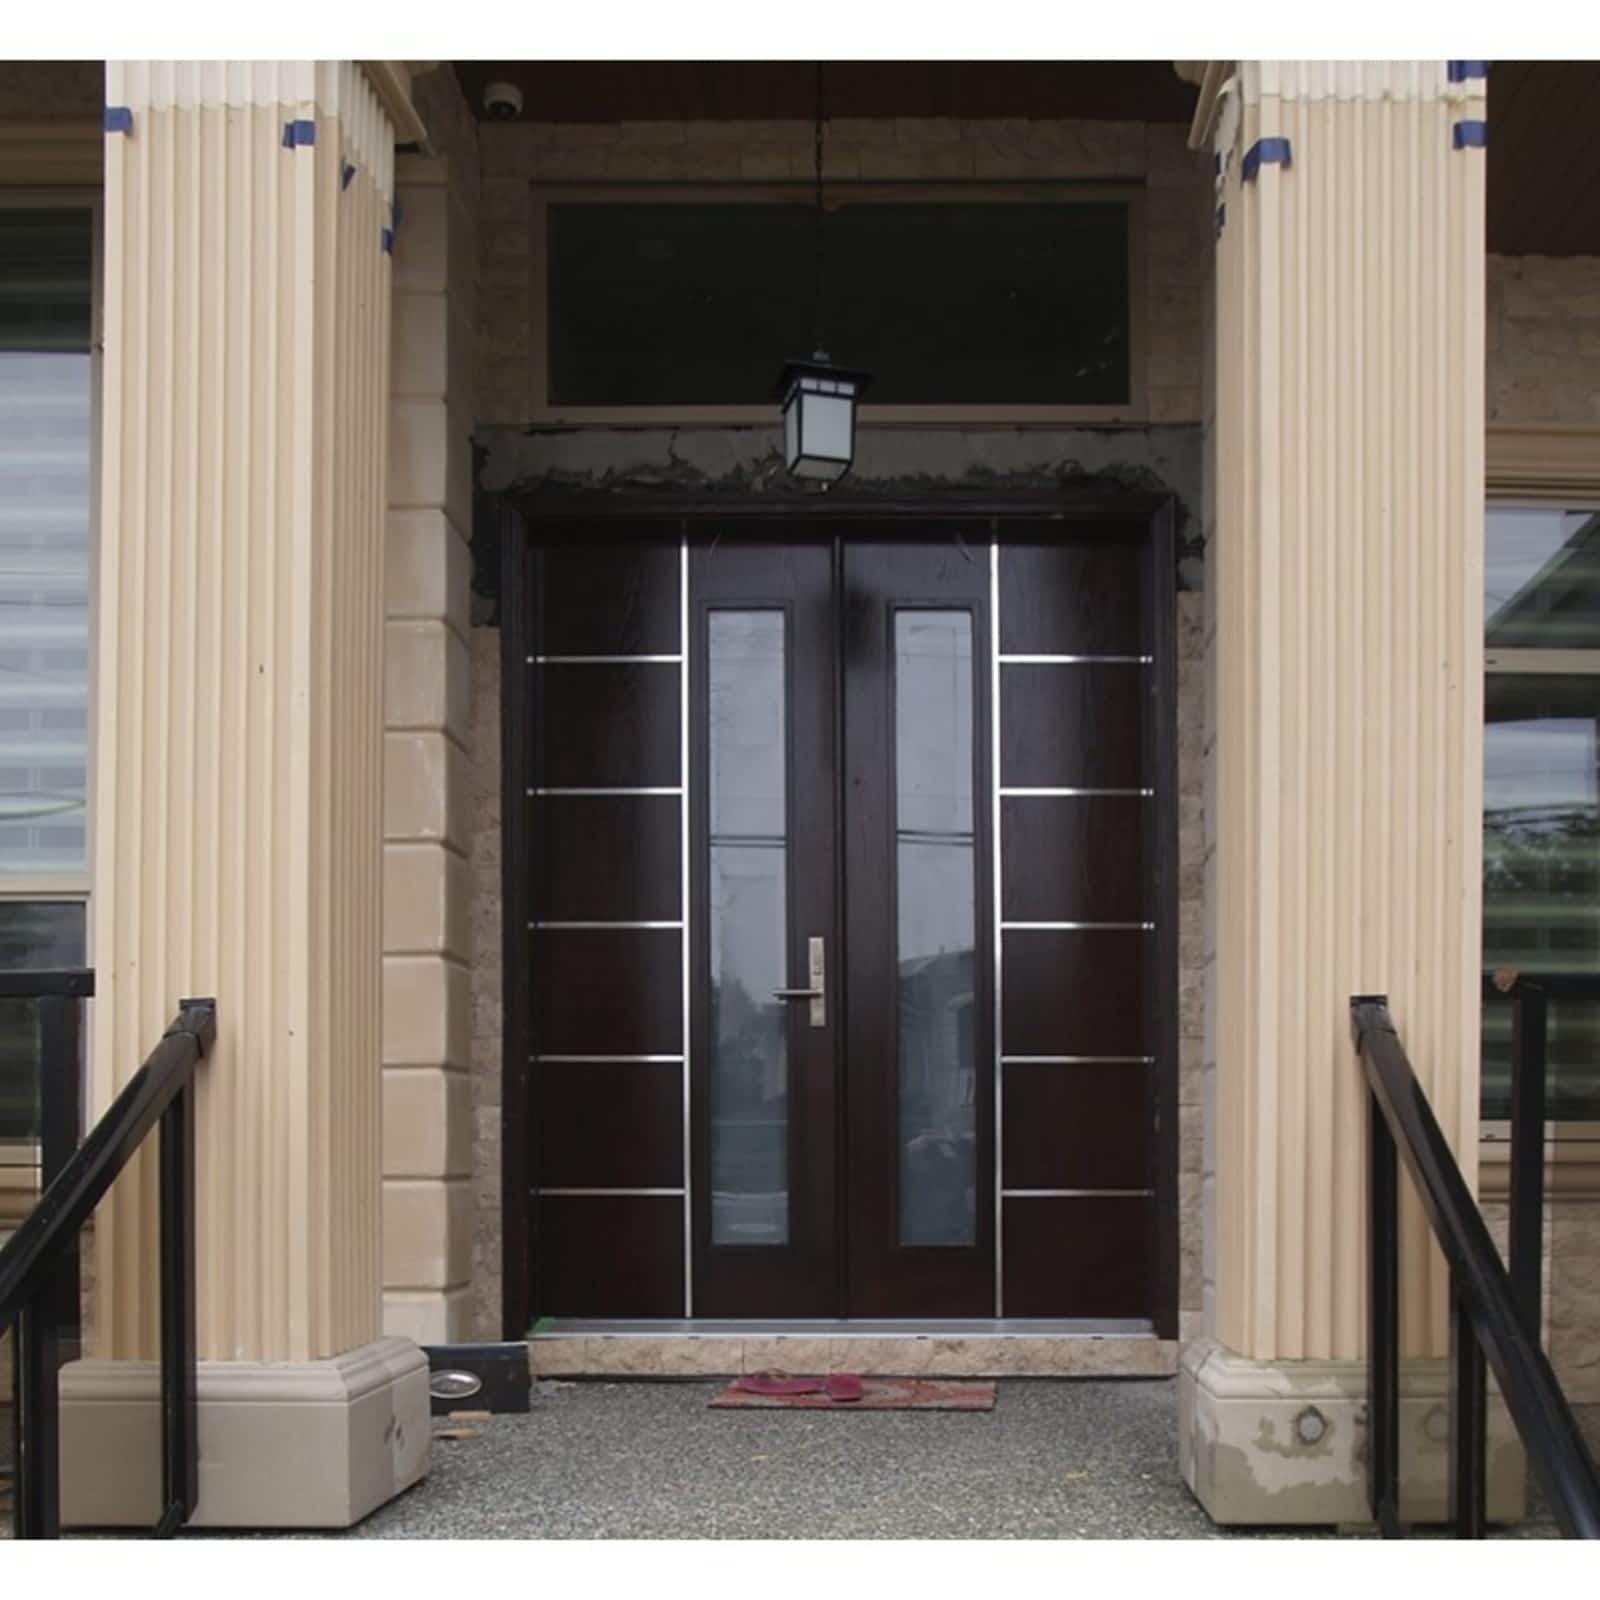 & Distinctive Doors Ltd - Opening Hours - 2-2440 14 Ave Vernon BC